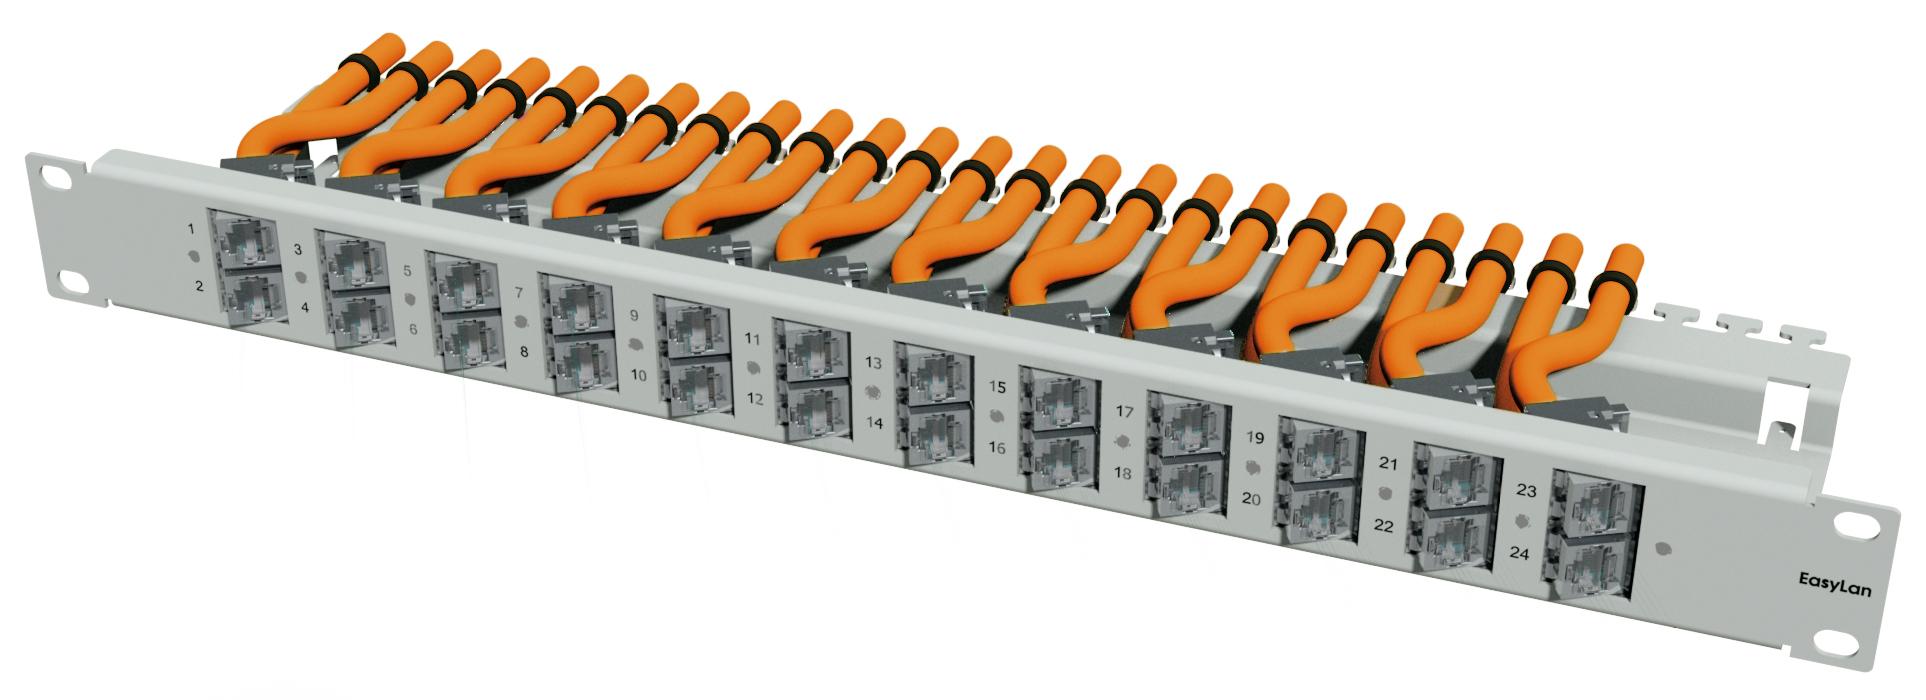 1 Stk preLink/fixLink Winkelpanel 1HE, 19, Variante 3 HEKR0240RR